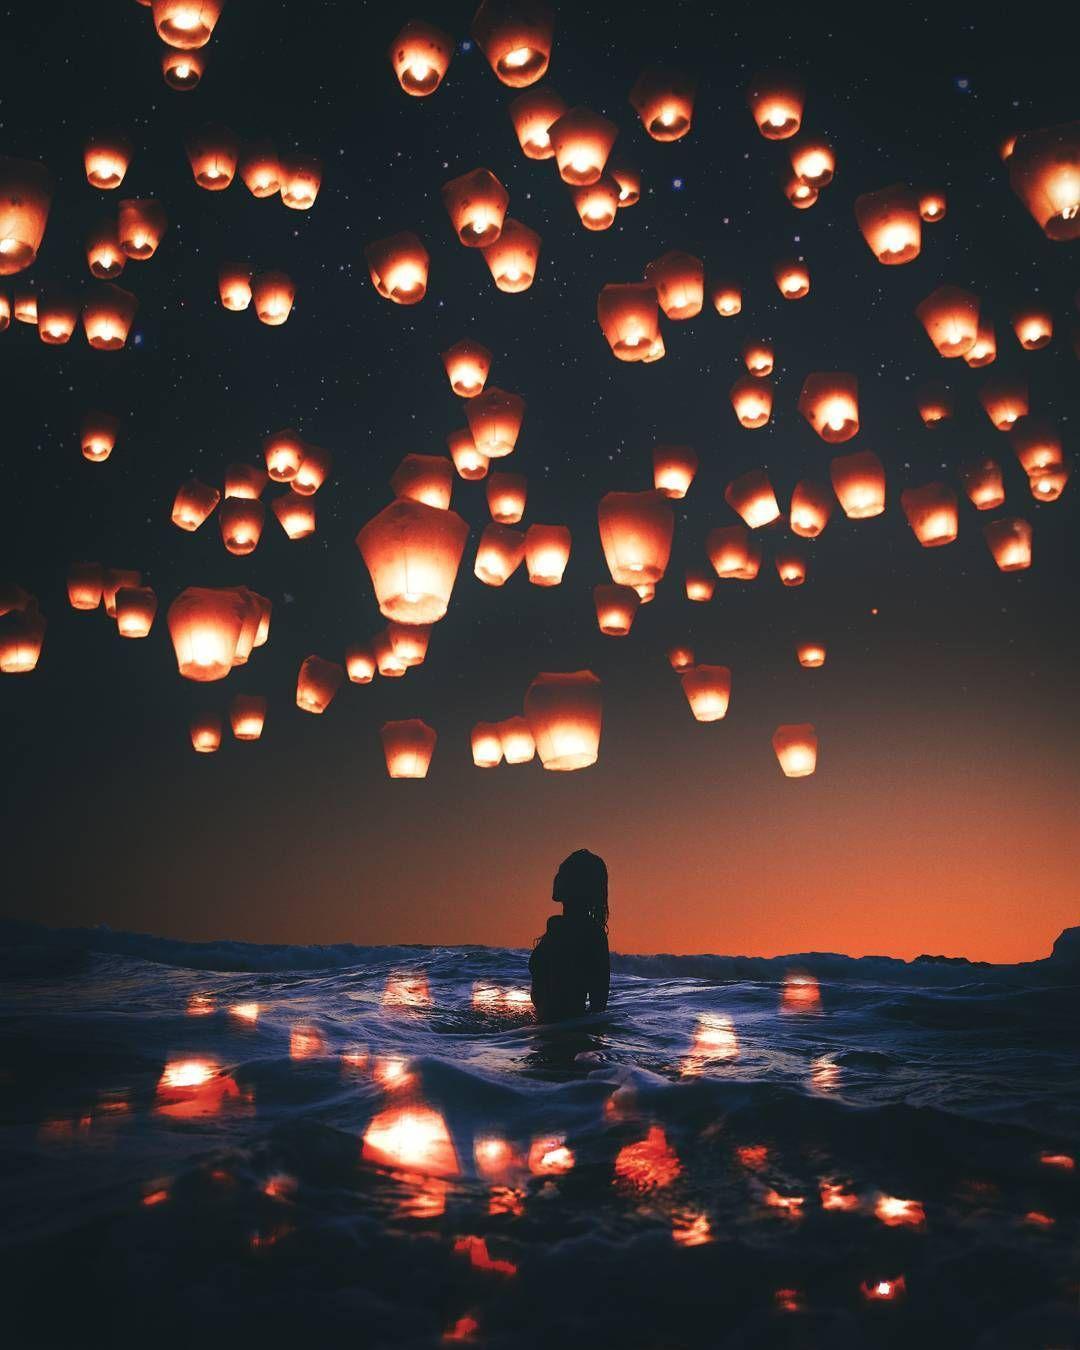 Let Yourself Fall Rizkiw Sky Lanterns Pinterest Photography Art Photography